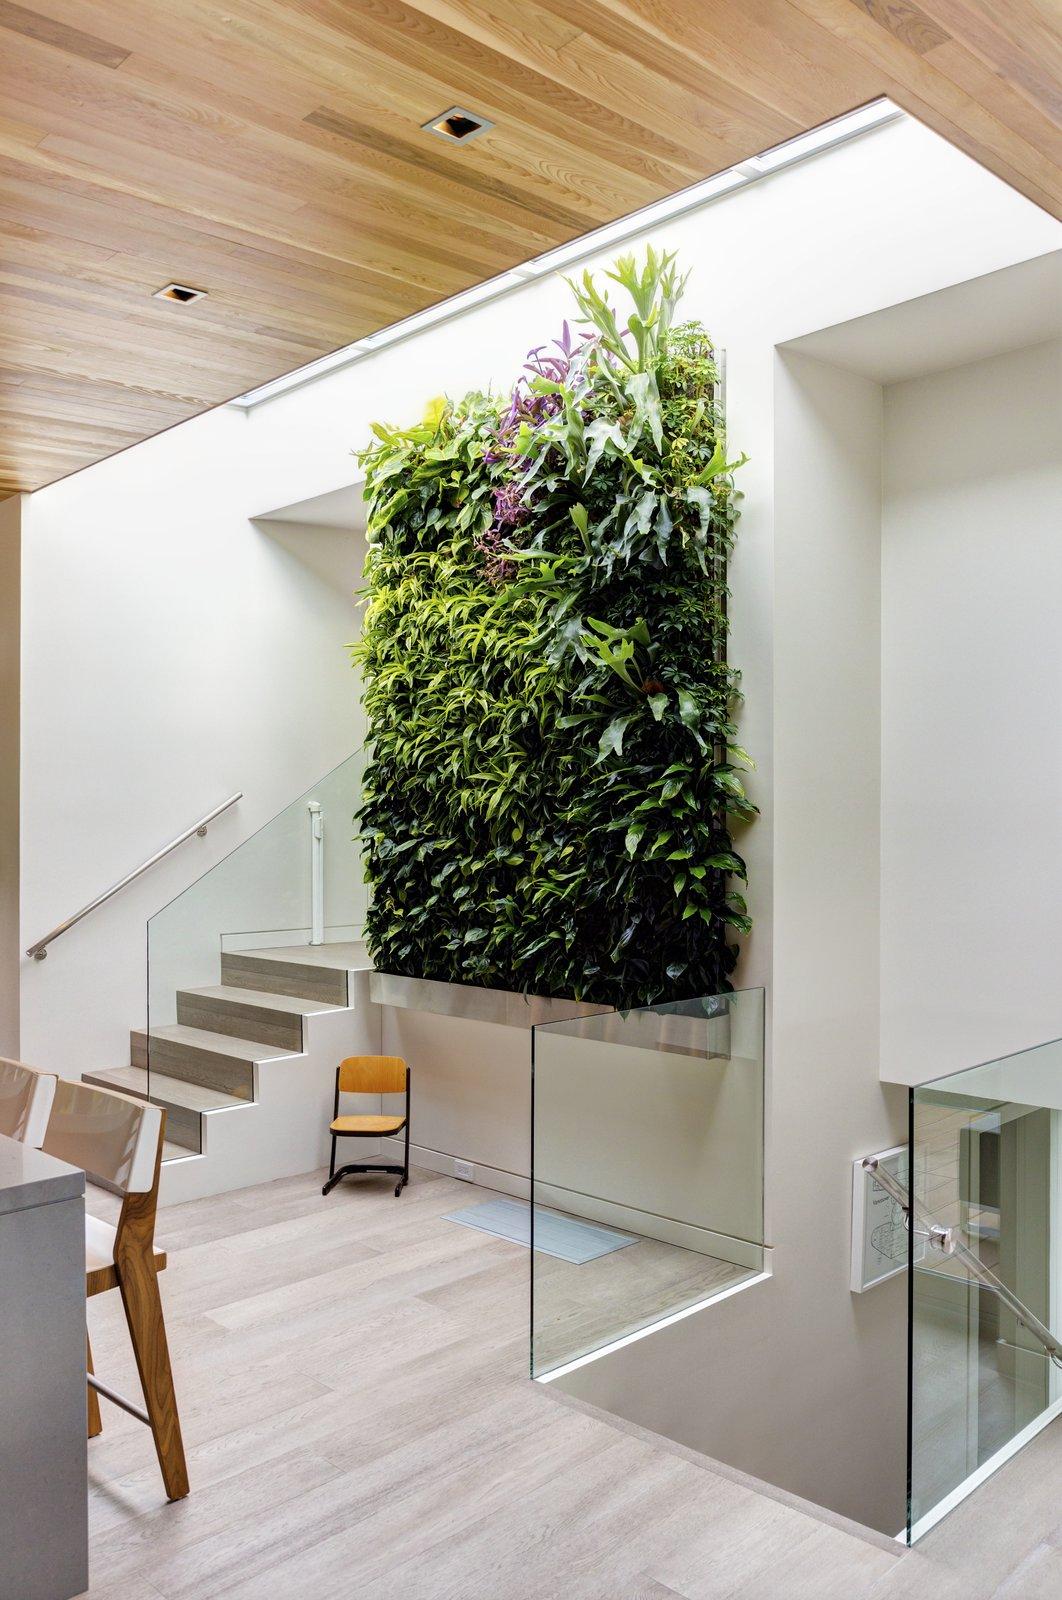 Garden Wall Residence, vertical garden  Garden Wall Residence by Garret Cord Werner